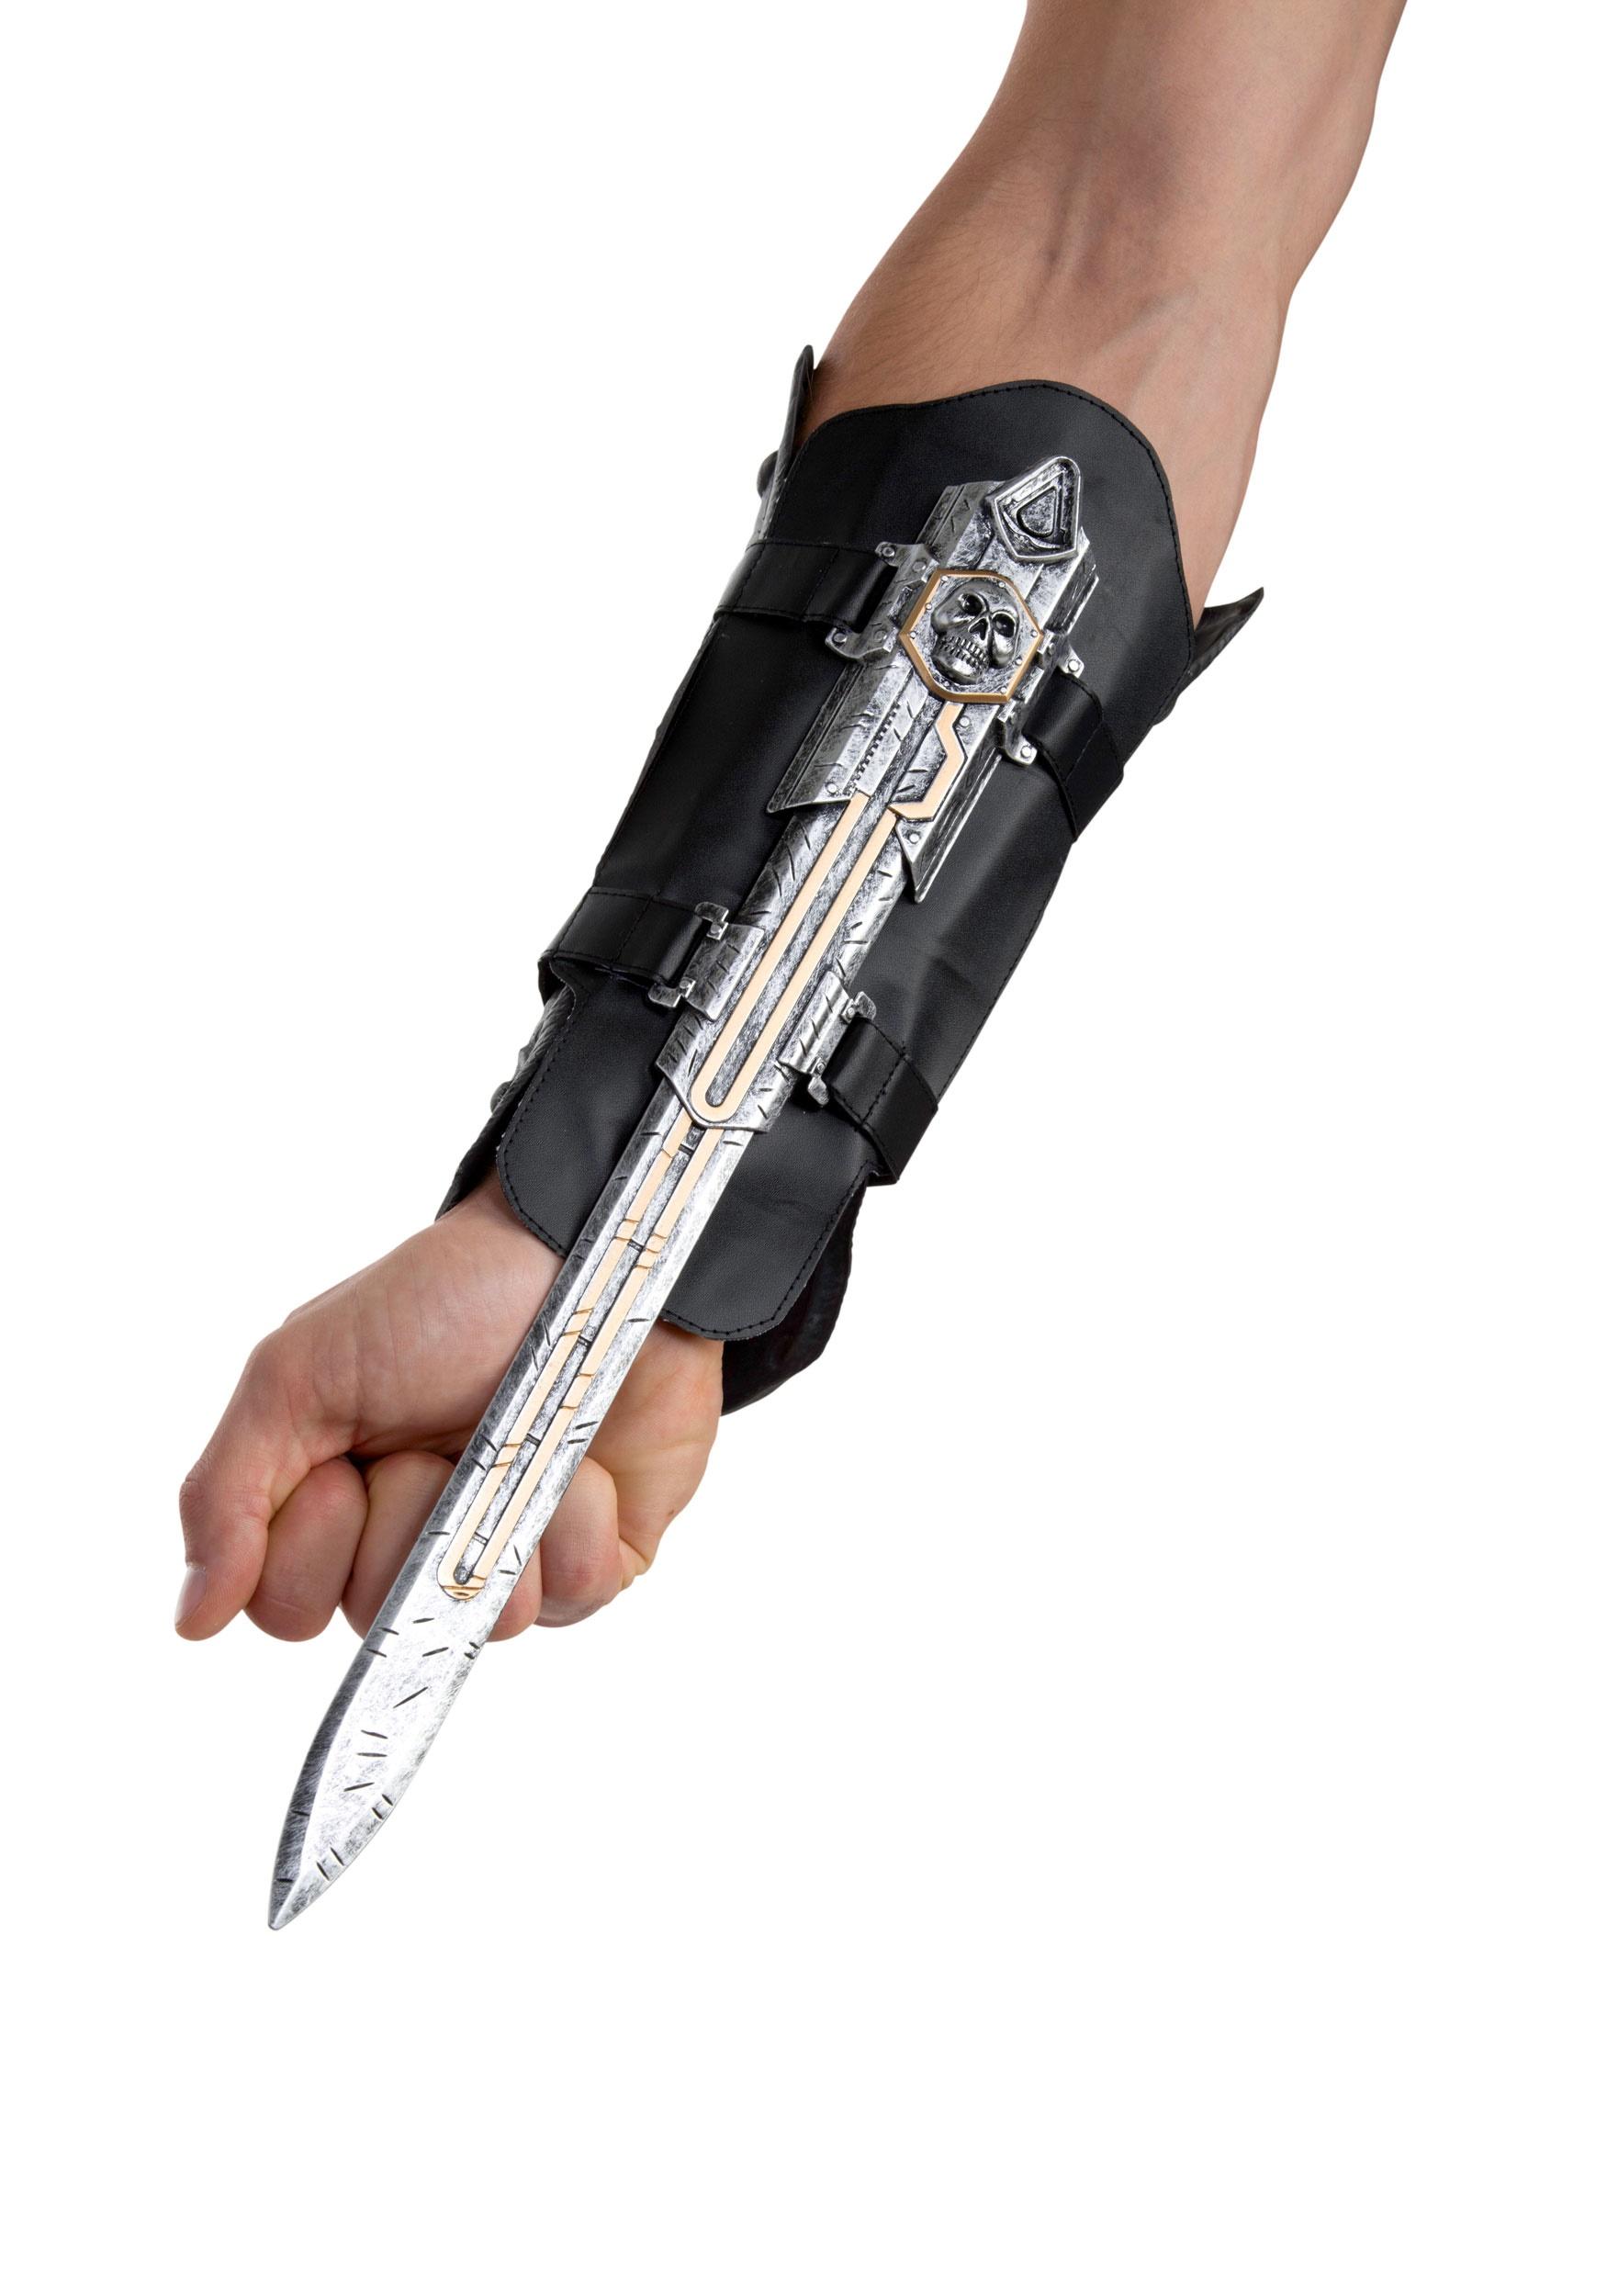 Assassins Creed Edward Kenway Hidden Blade Gauntlet